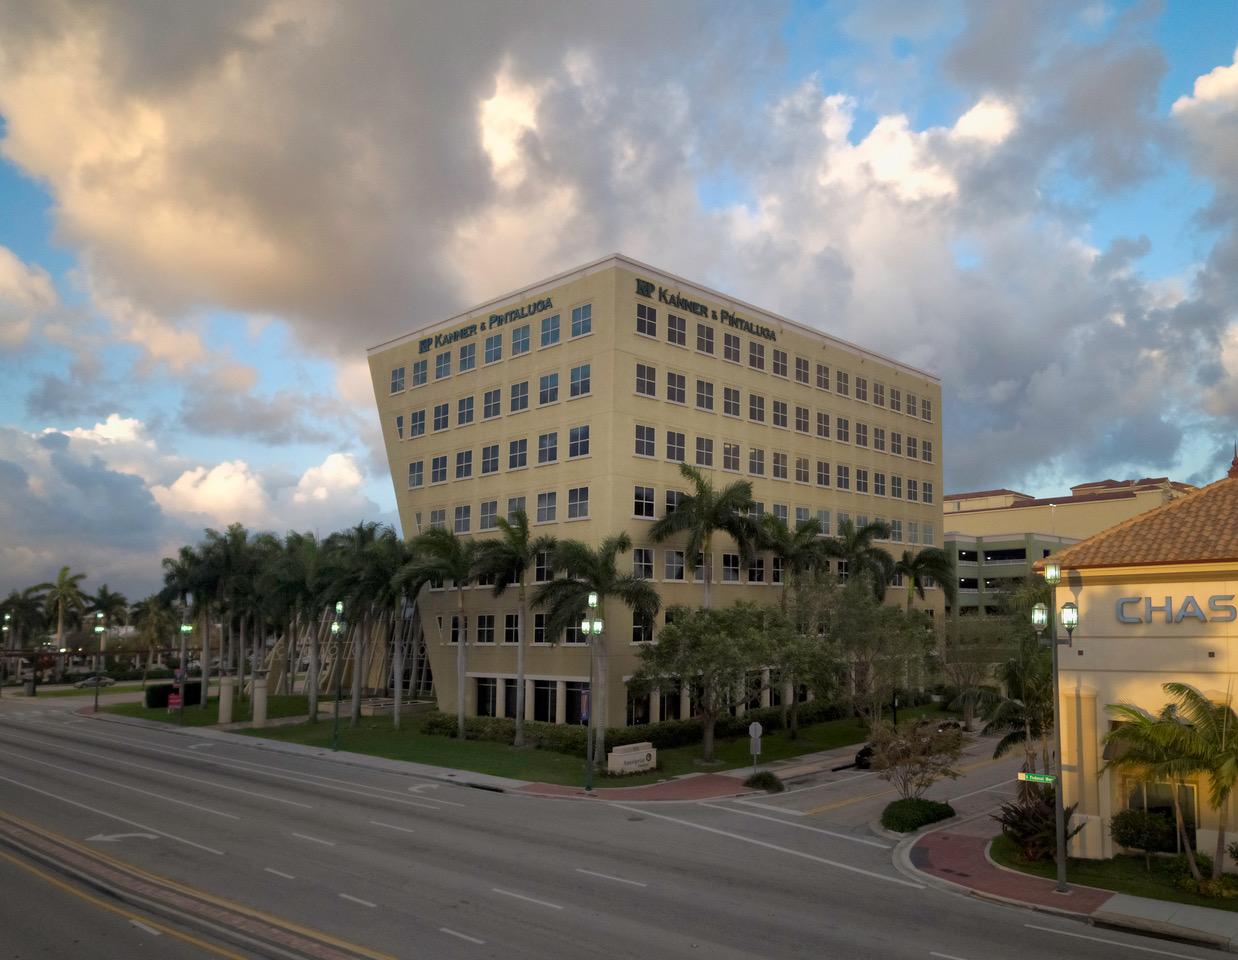 Bufete office building